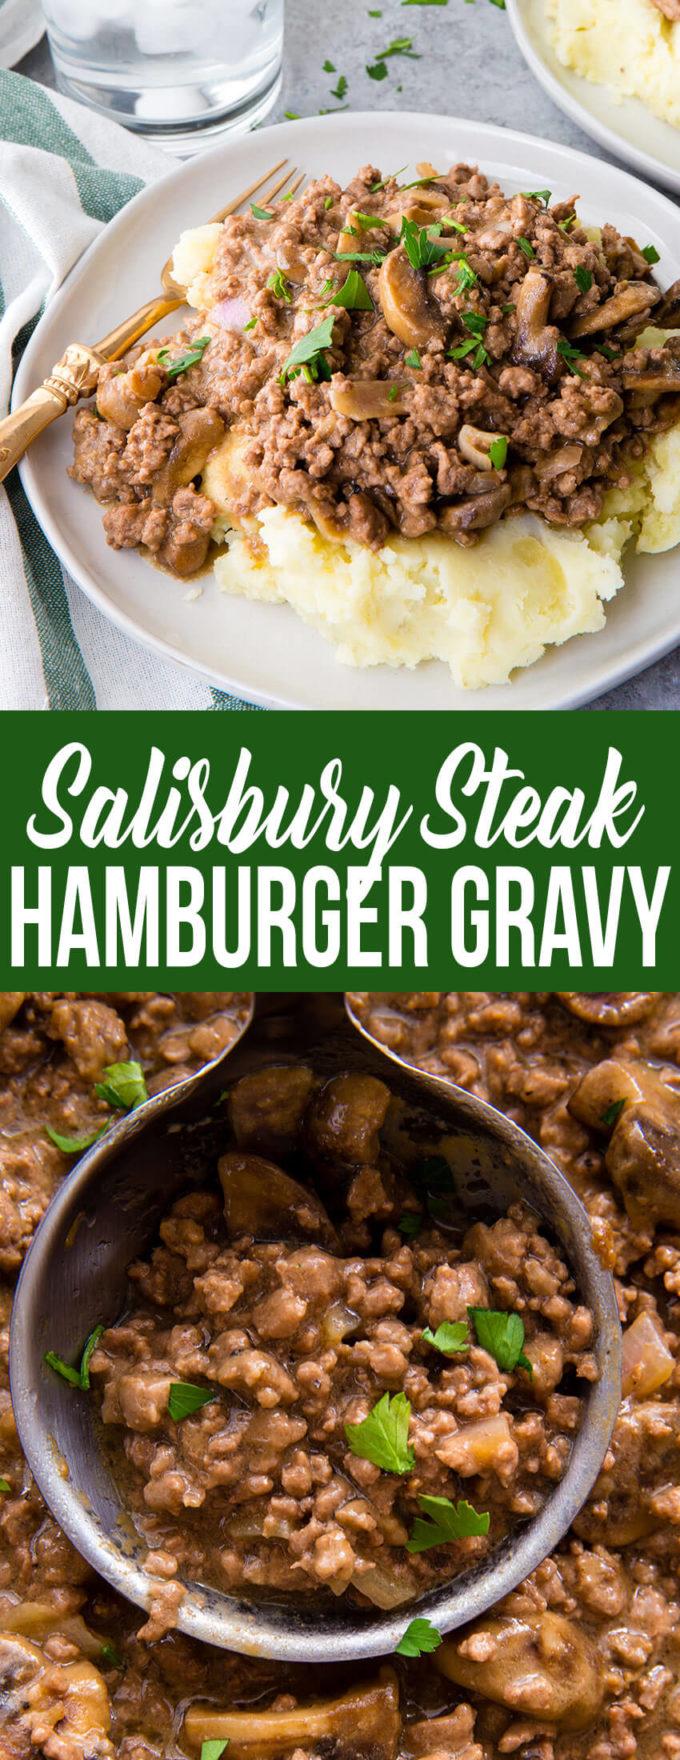 Easy Salisbury steak Hamburger gravy!